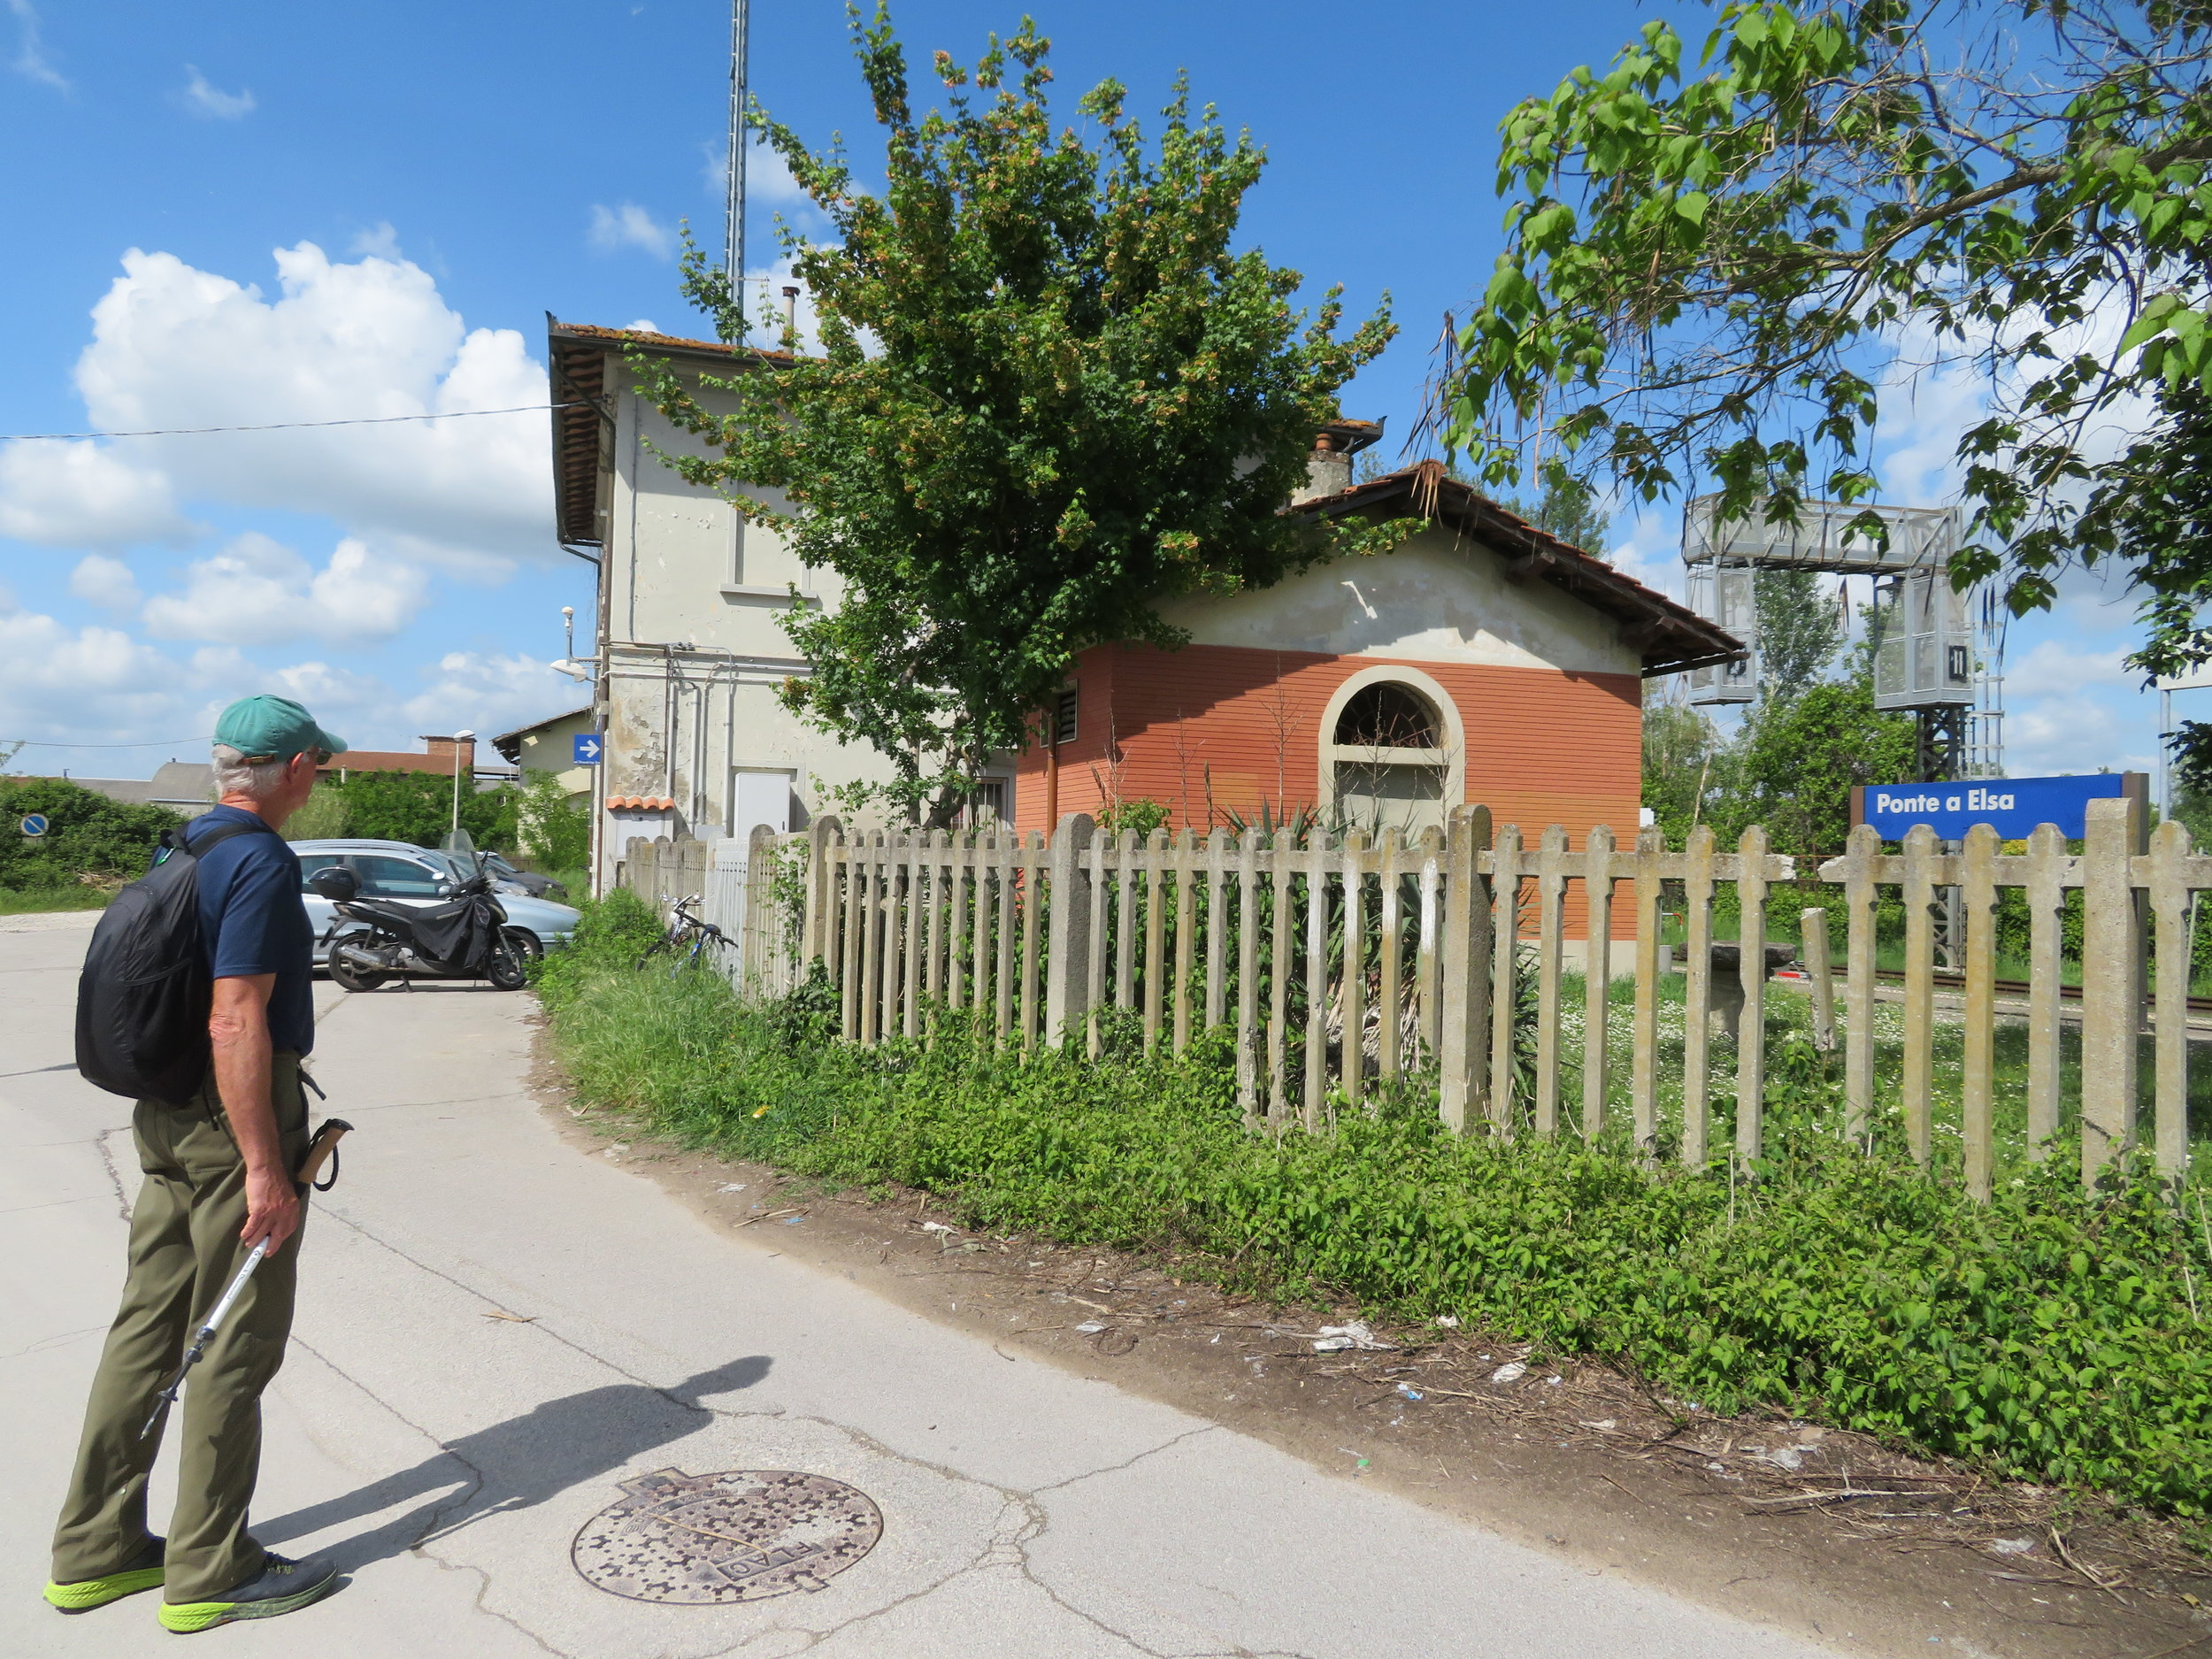 Ponte a Elsa 'stazione' was pretty much deserted.